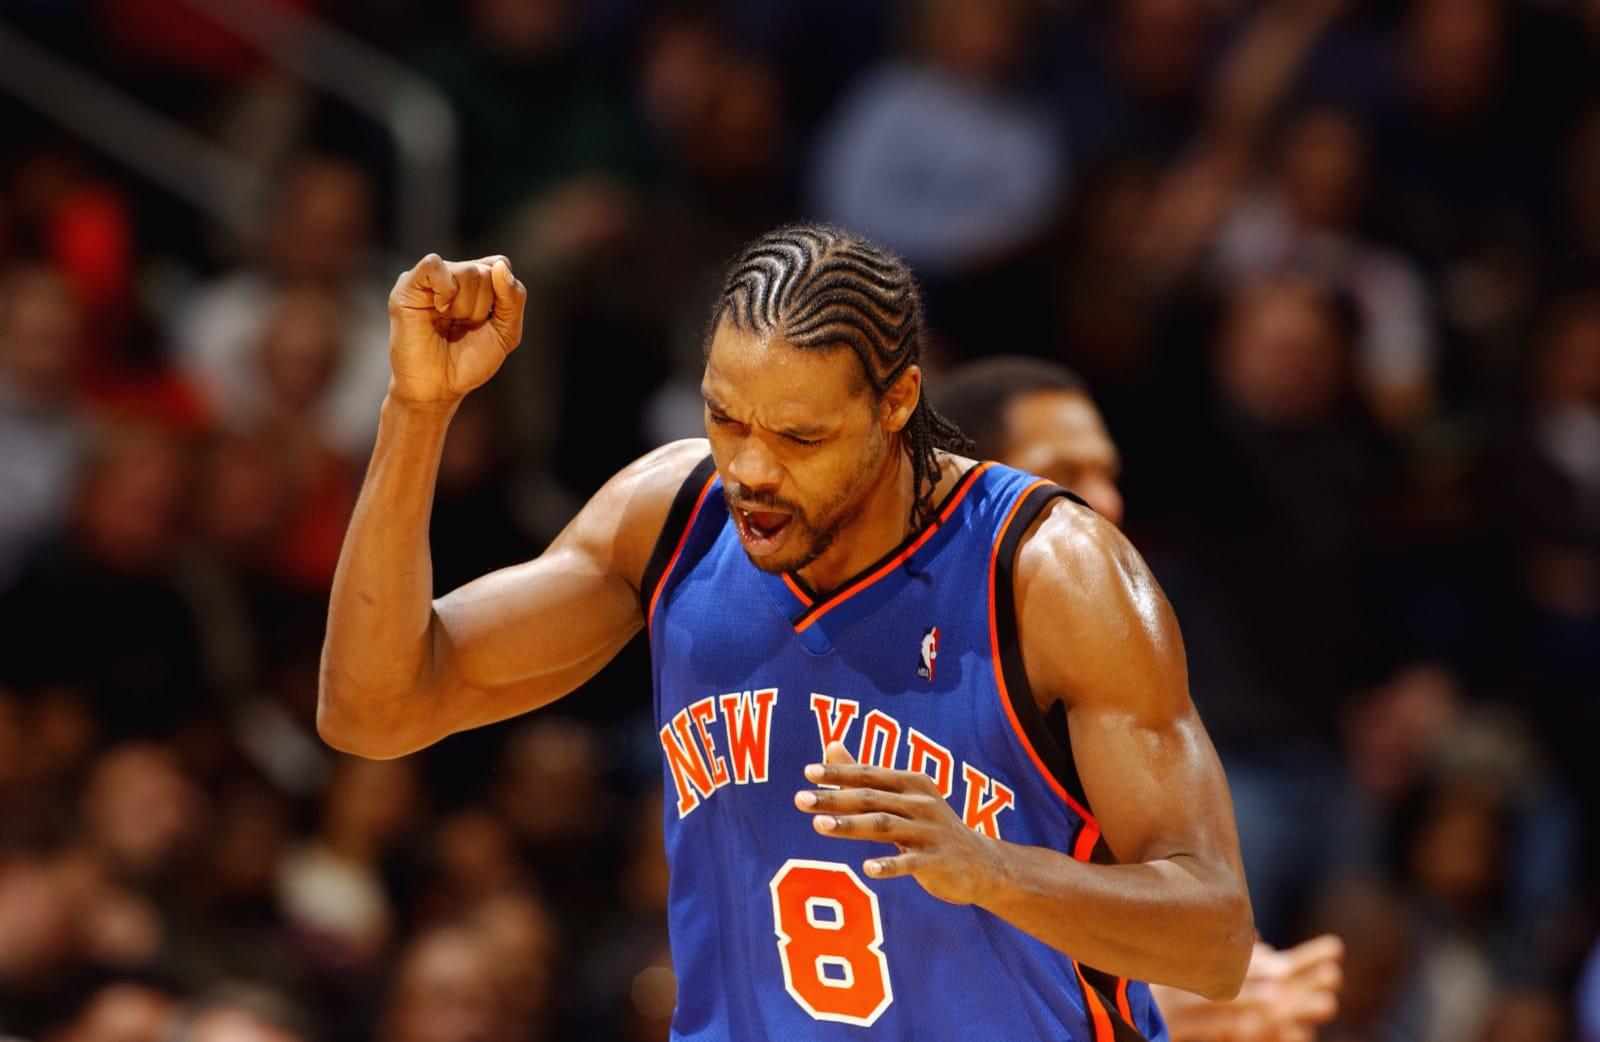 Latrell Sprewell, New York Knicks